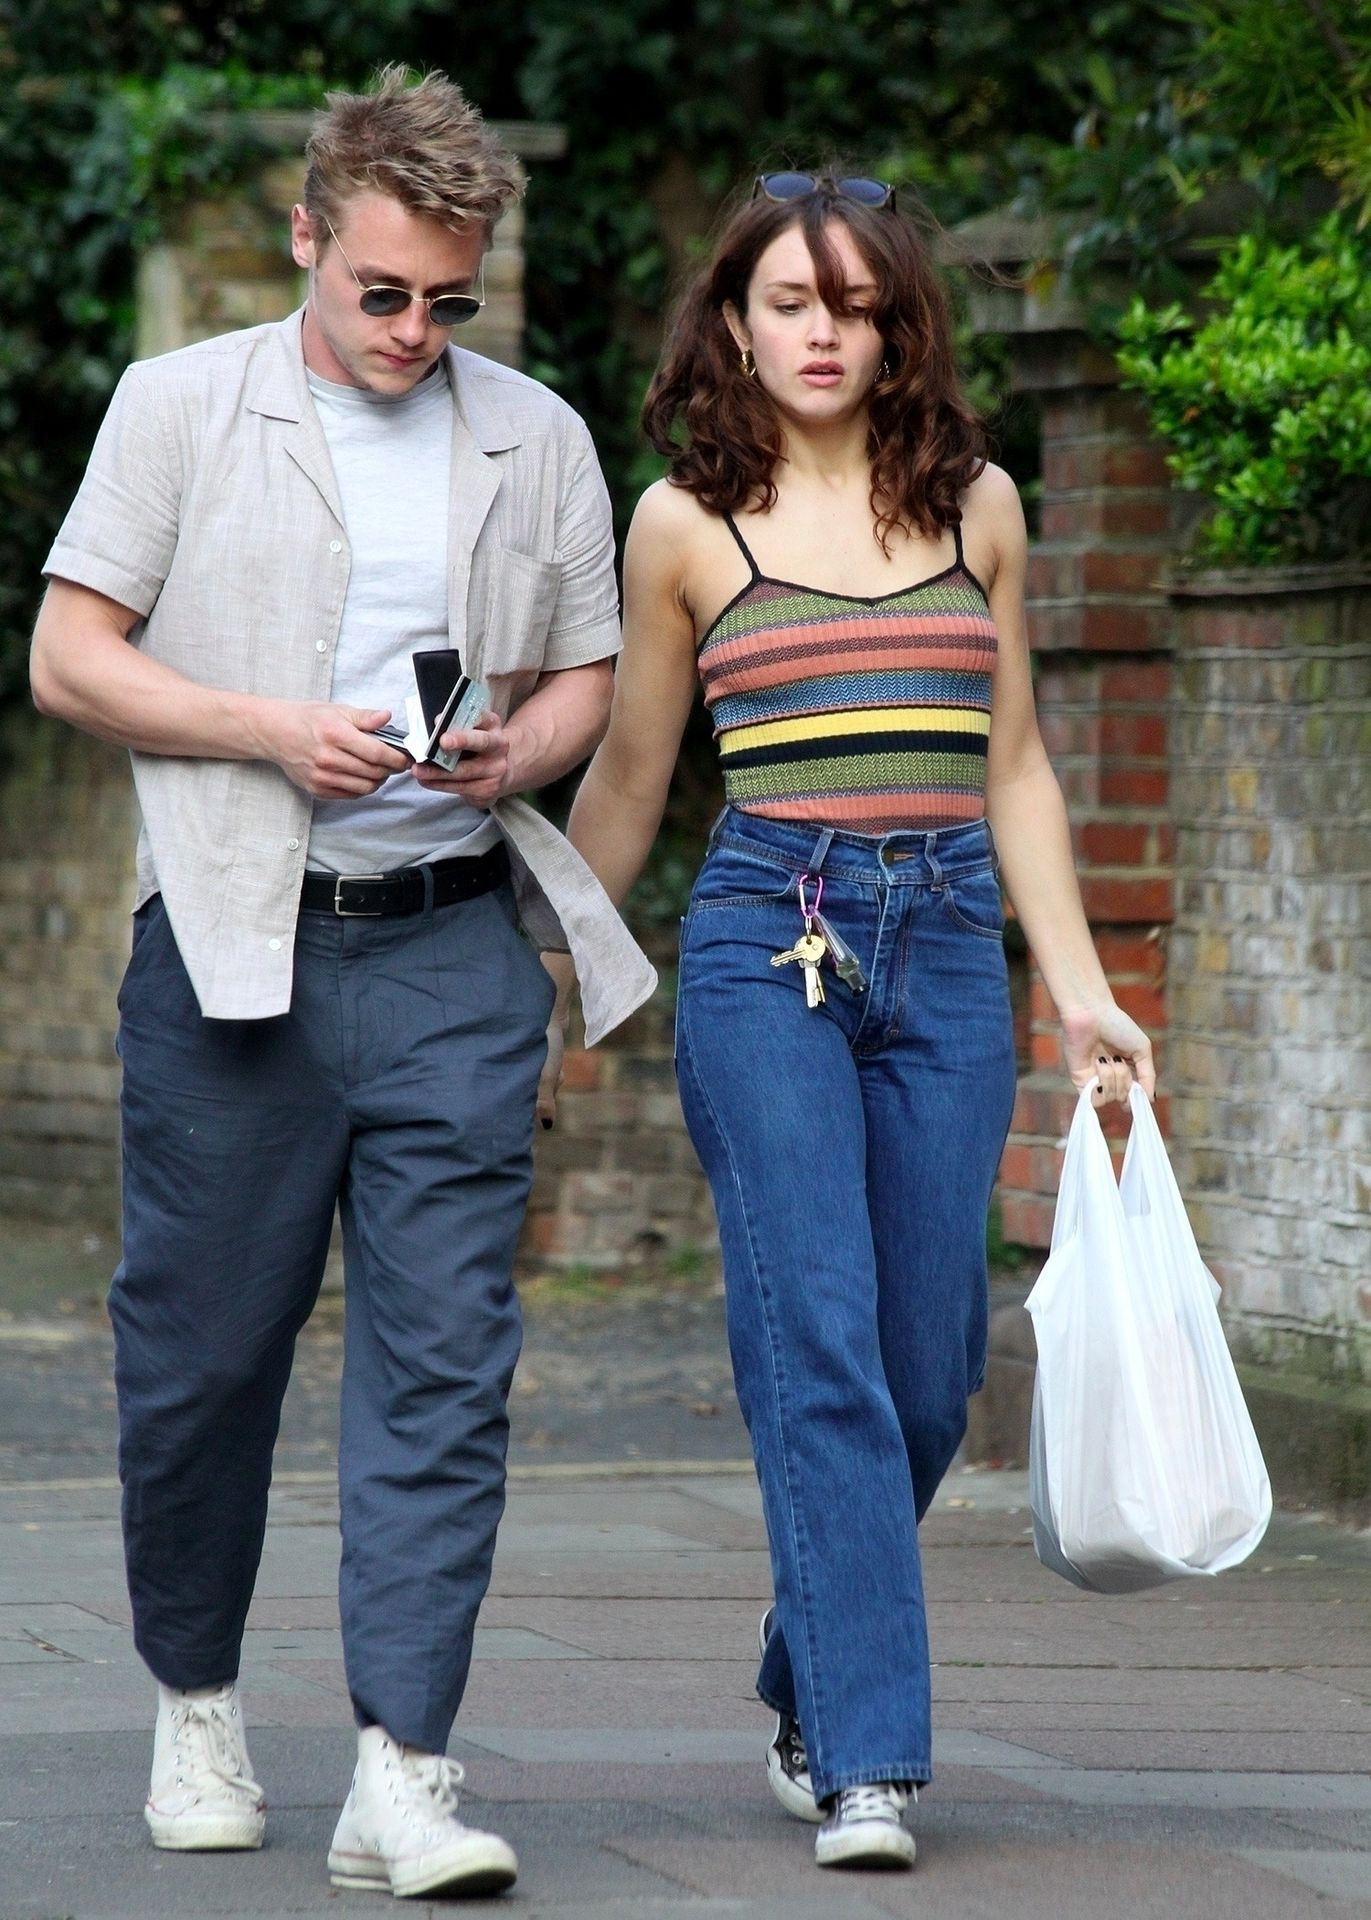 Ben Hardy Walks Hand In Hand With Actress Girlfriend Olivia Cooke 0010